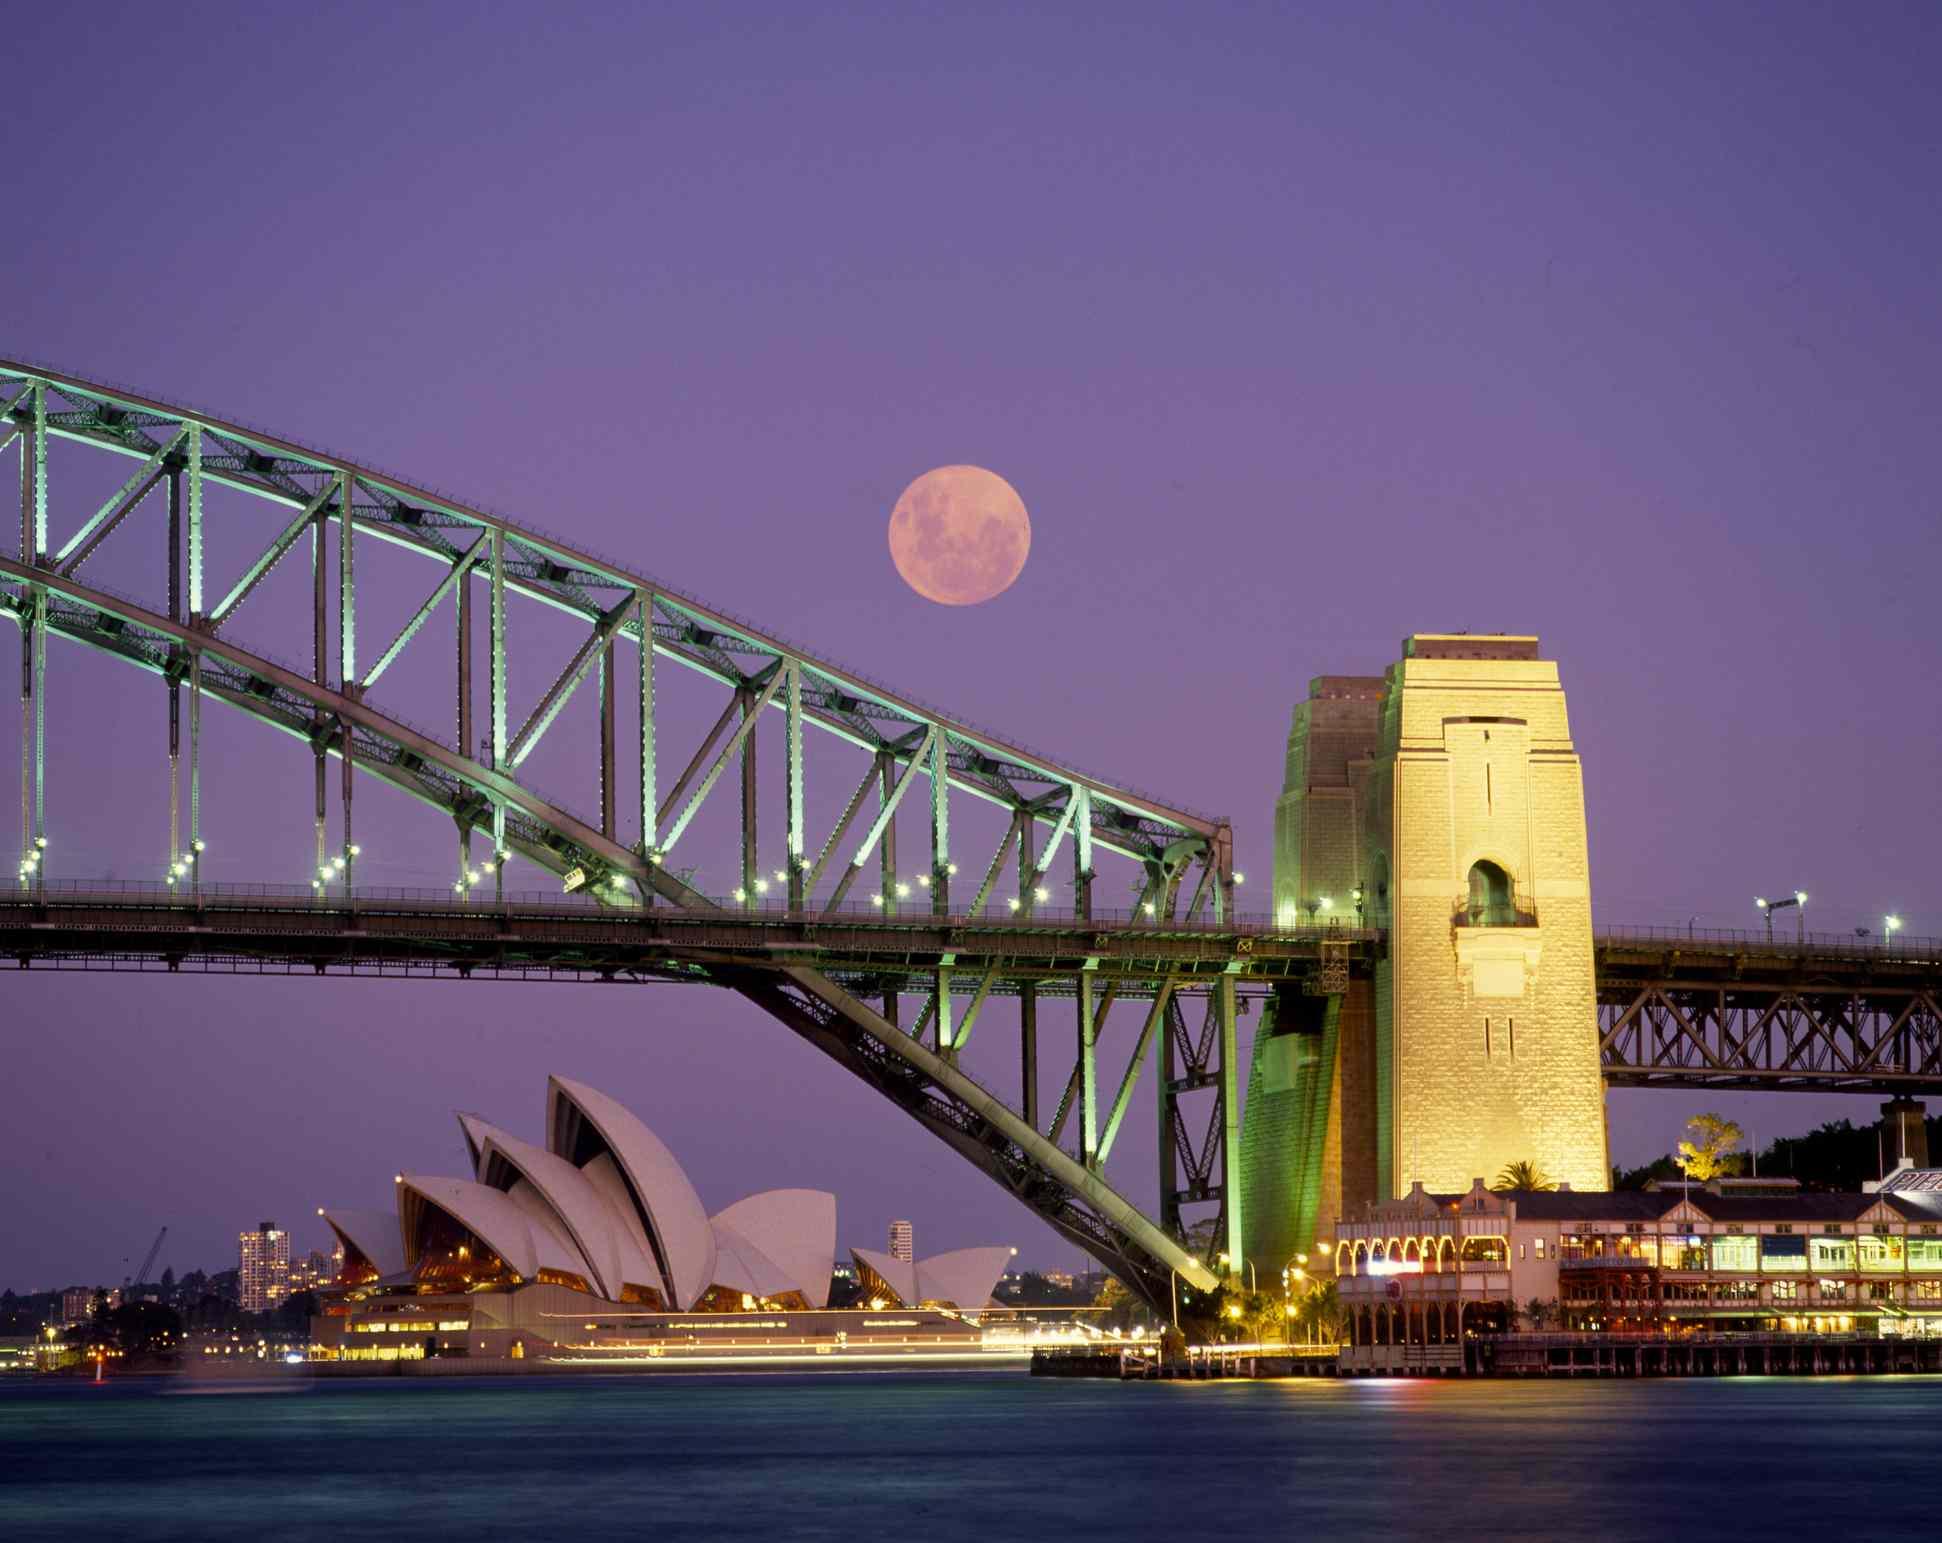 Sydney Harbour Bridge, Opera House & full moon